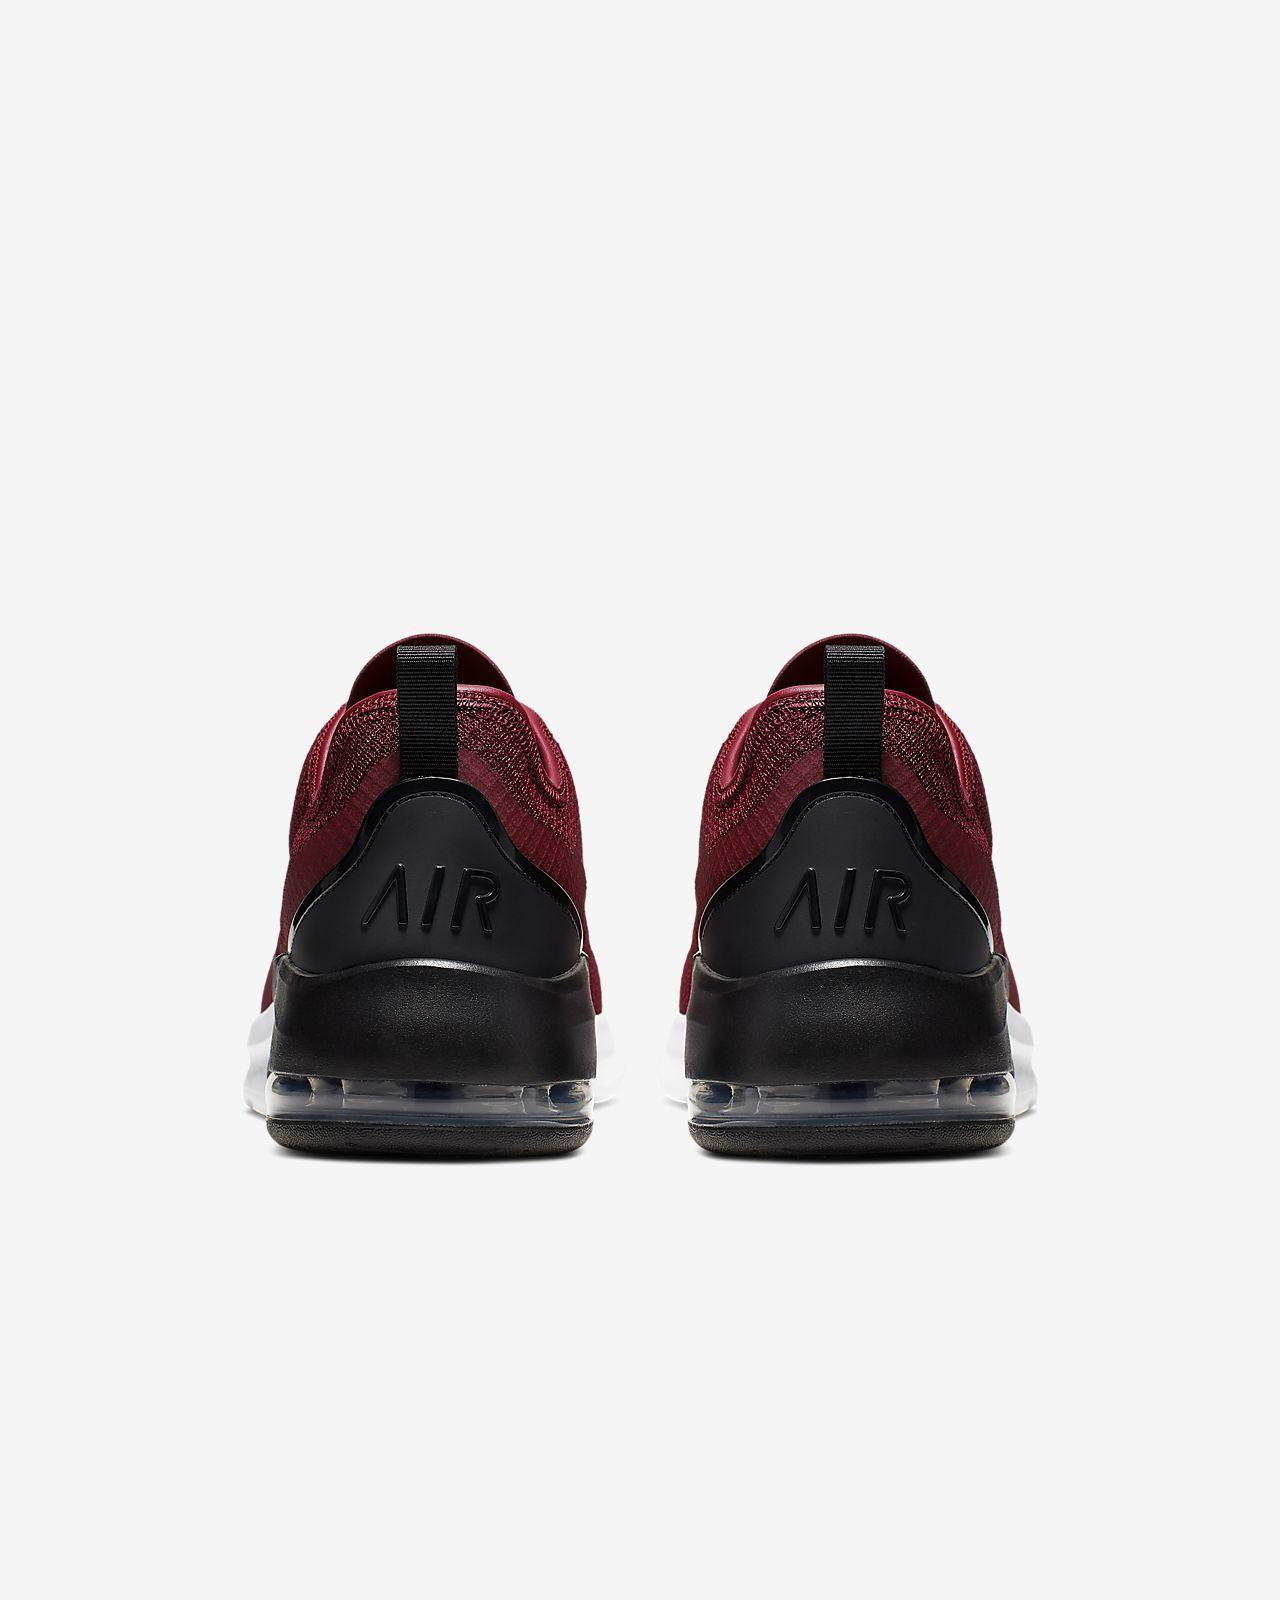 Nike Air Max Motion 2 Herren Sneaker schwarz weiß blau AO0266 001